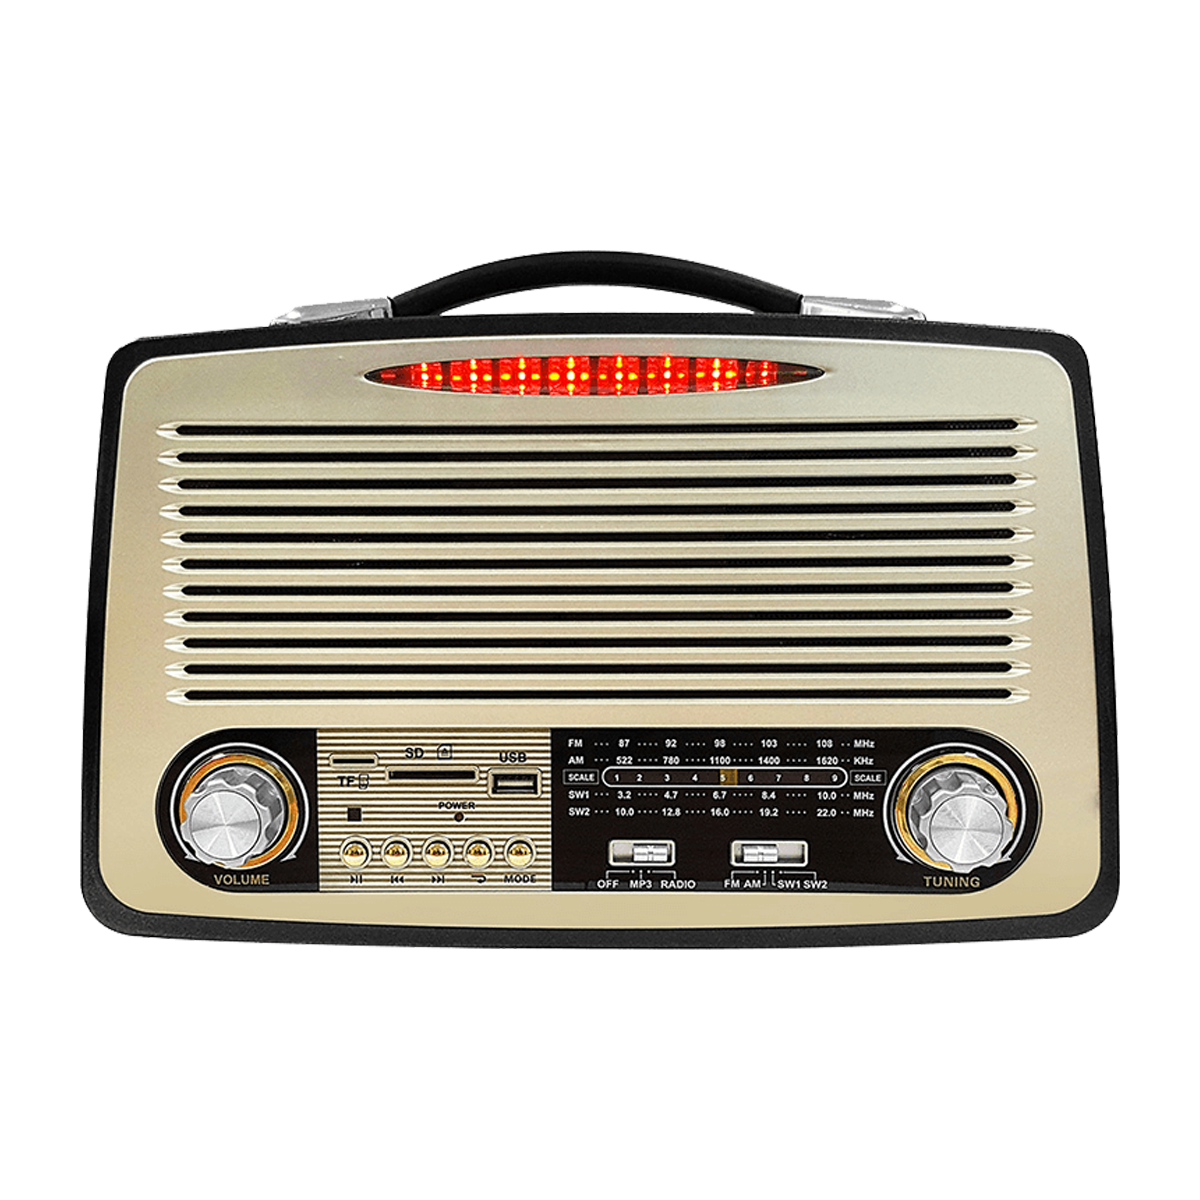 HomeTech HT 200BT Nostaljik Radyo Hoparlör  Kahverengi